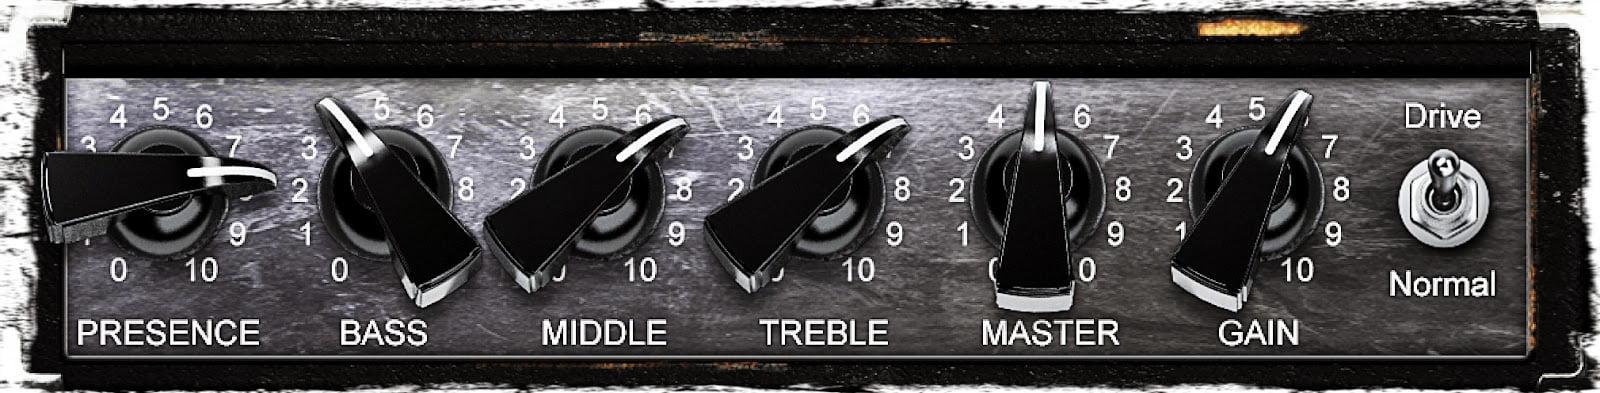 guitar amp settings guide reference for 19 amplifier presets guitar chalk. Black Bedroom Furniture Sets. Home Design Ideas